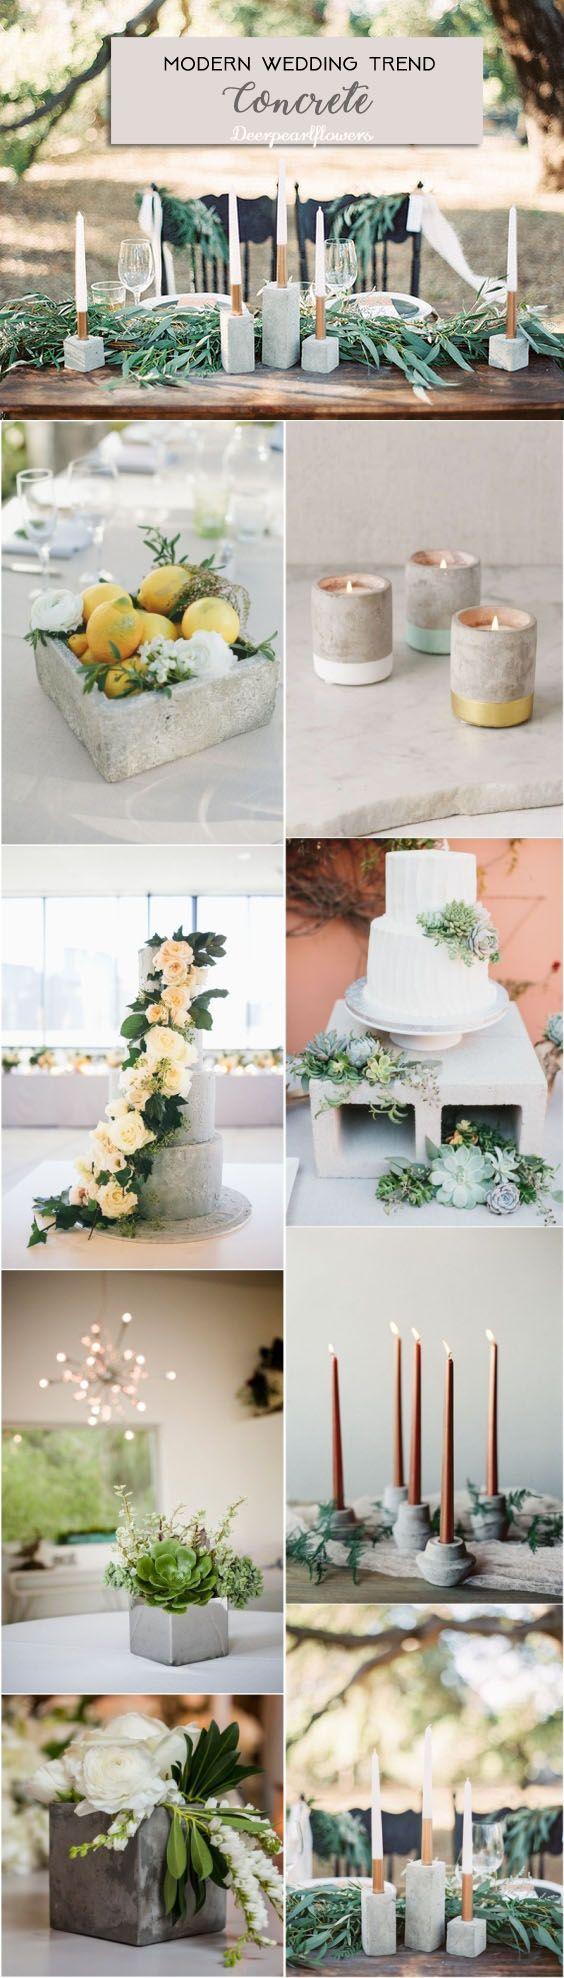 Modern cement grey wedding ideas / http://www.deerpearlflowers.com/modern-wedding-theme-ideas/